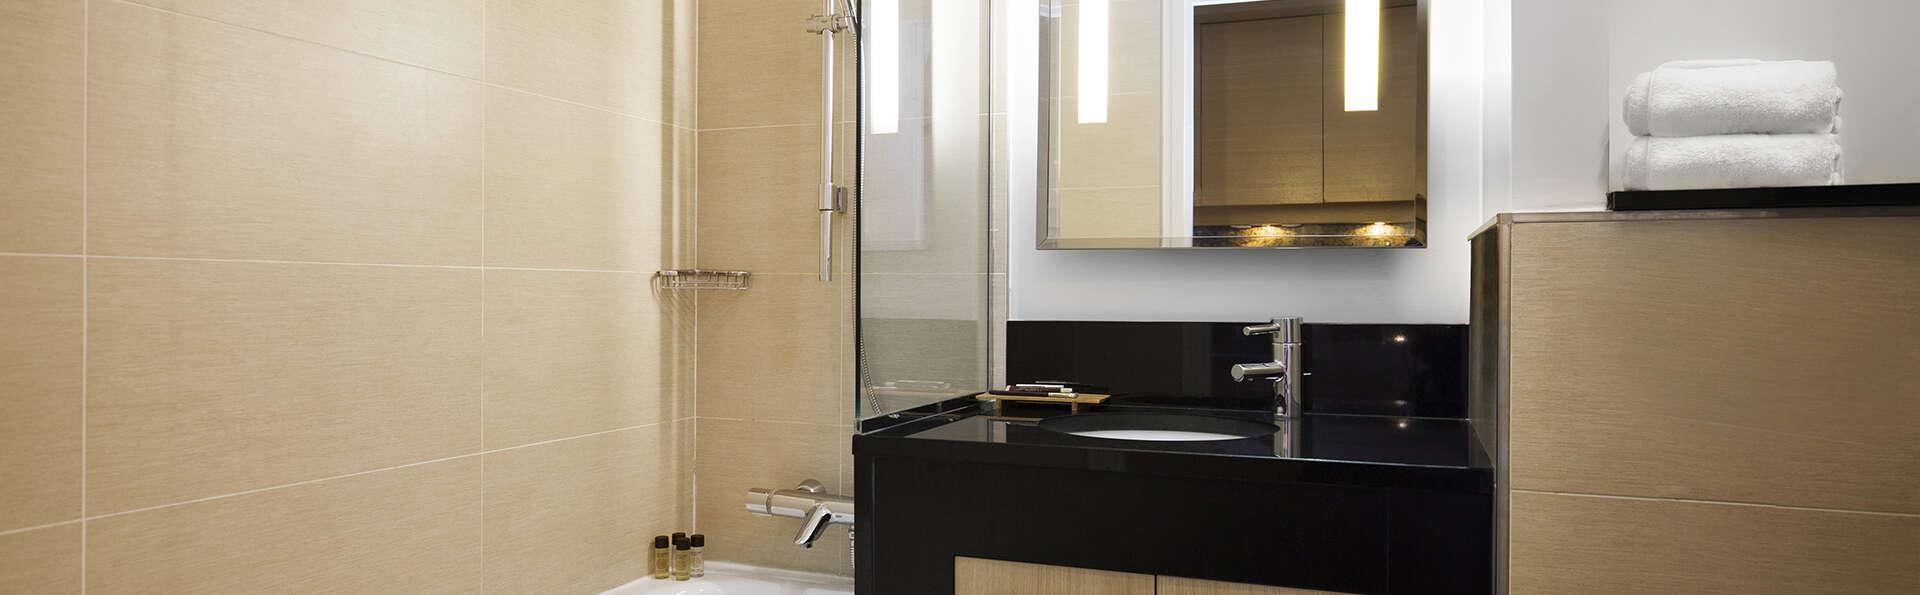 Relais SPA Chessy - EDIT_NEW_Bathroom.jpg